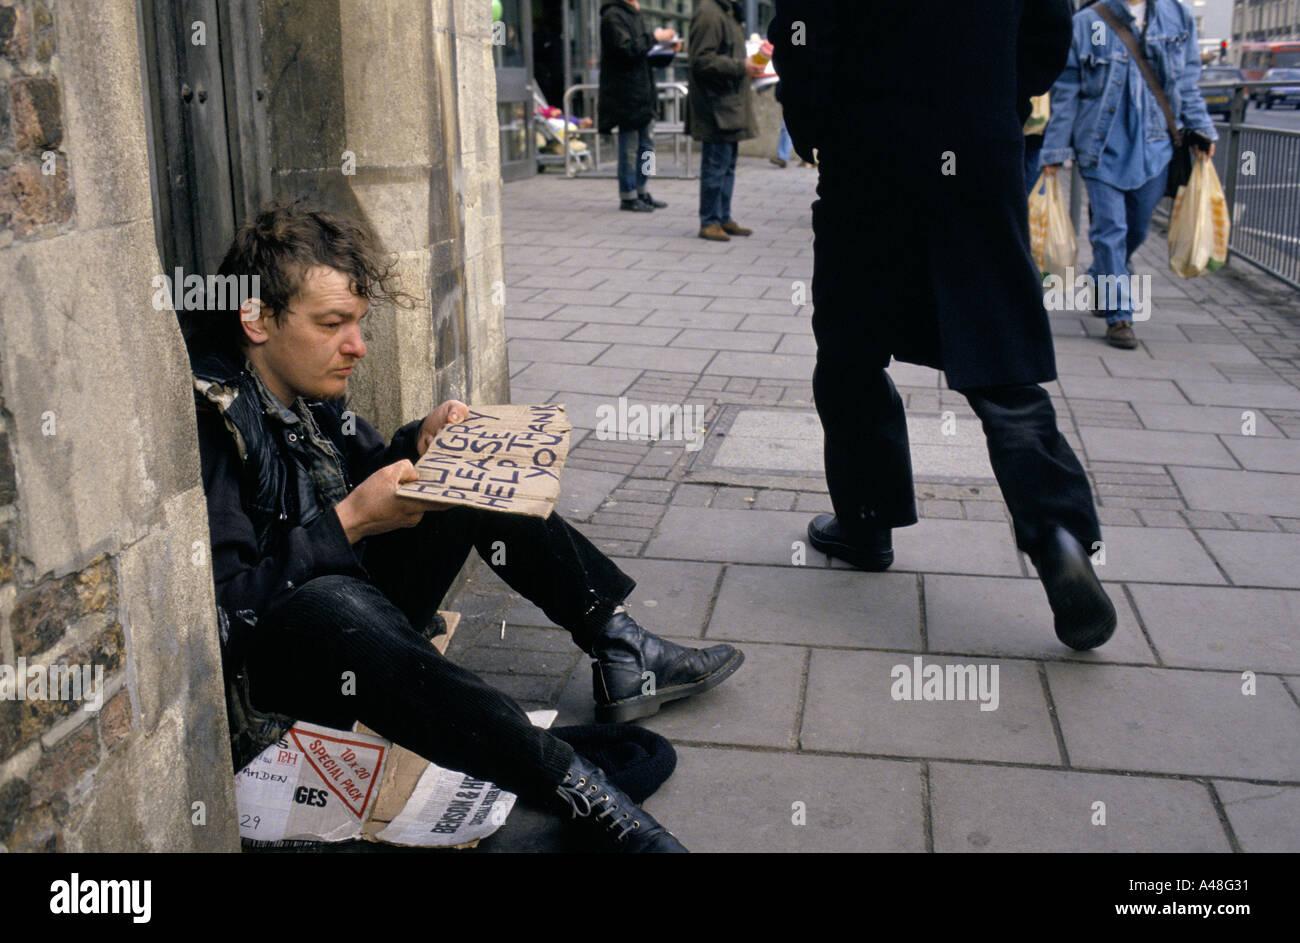 Homeless person beggin...